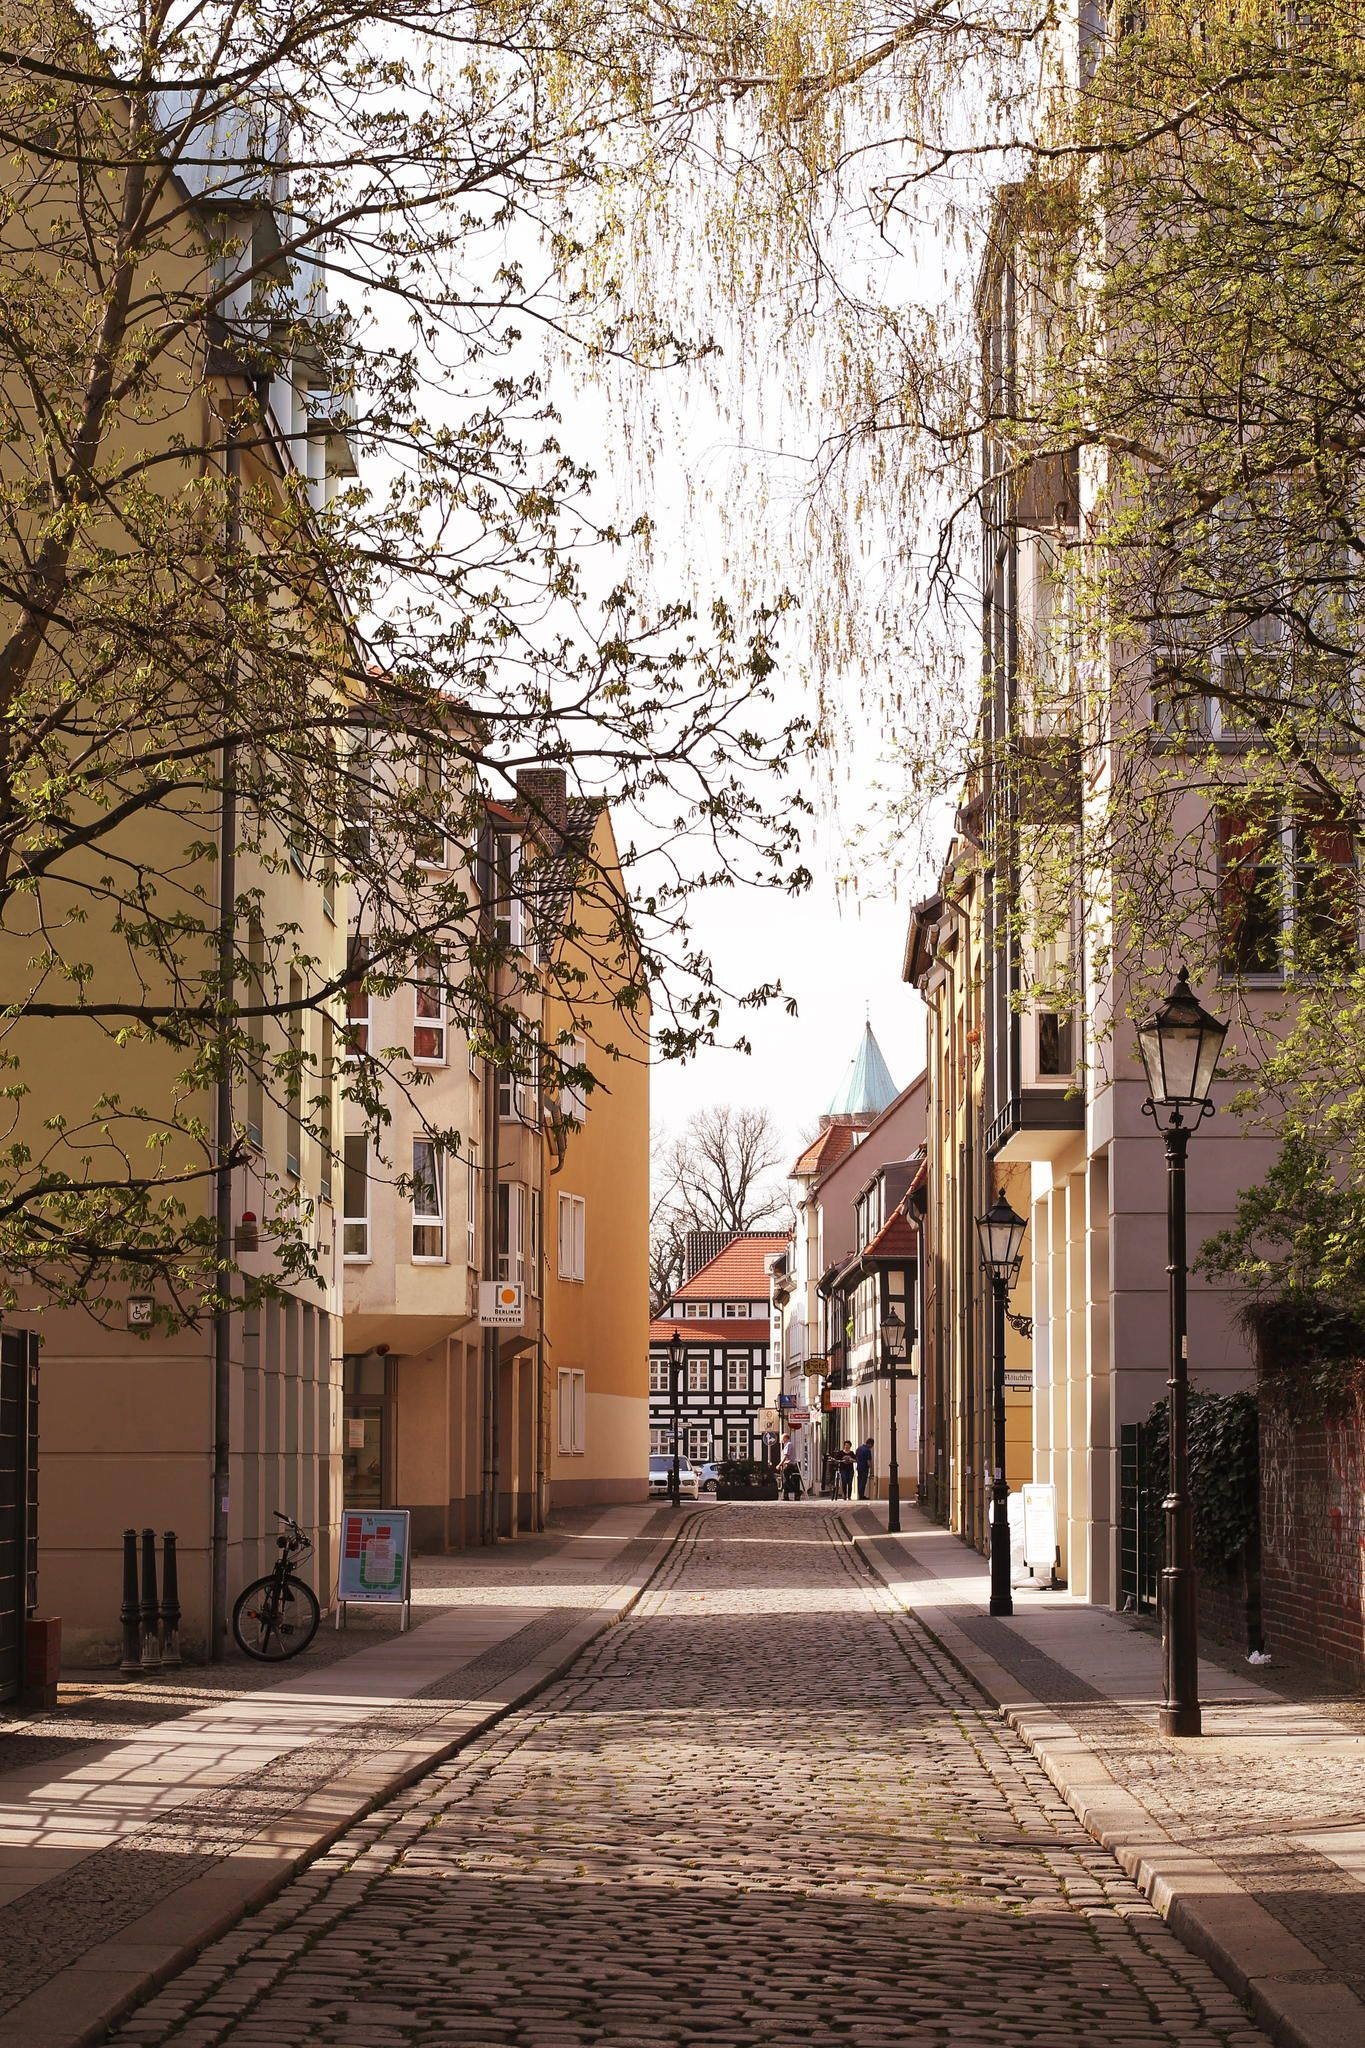 spandau borough of berlin, germany | travel photography #cities